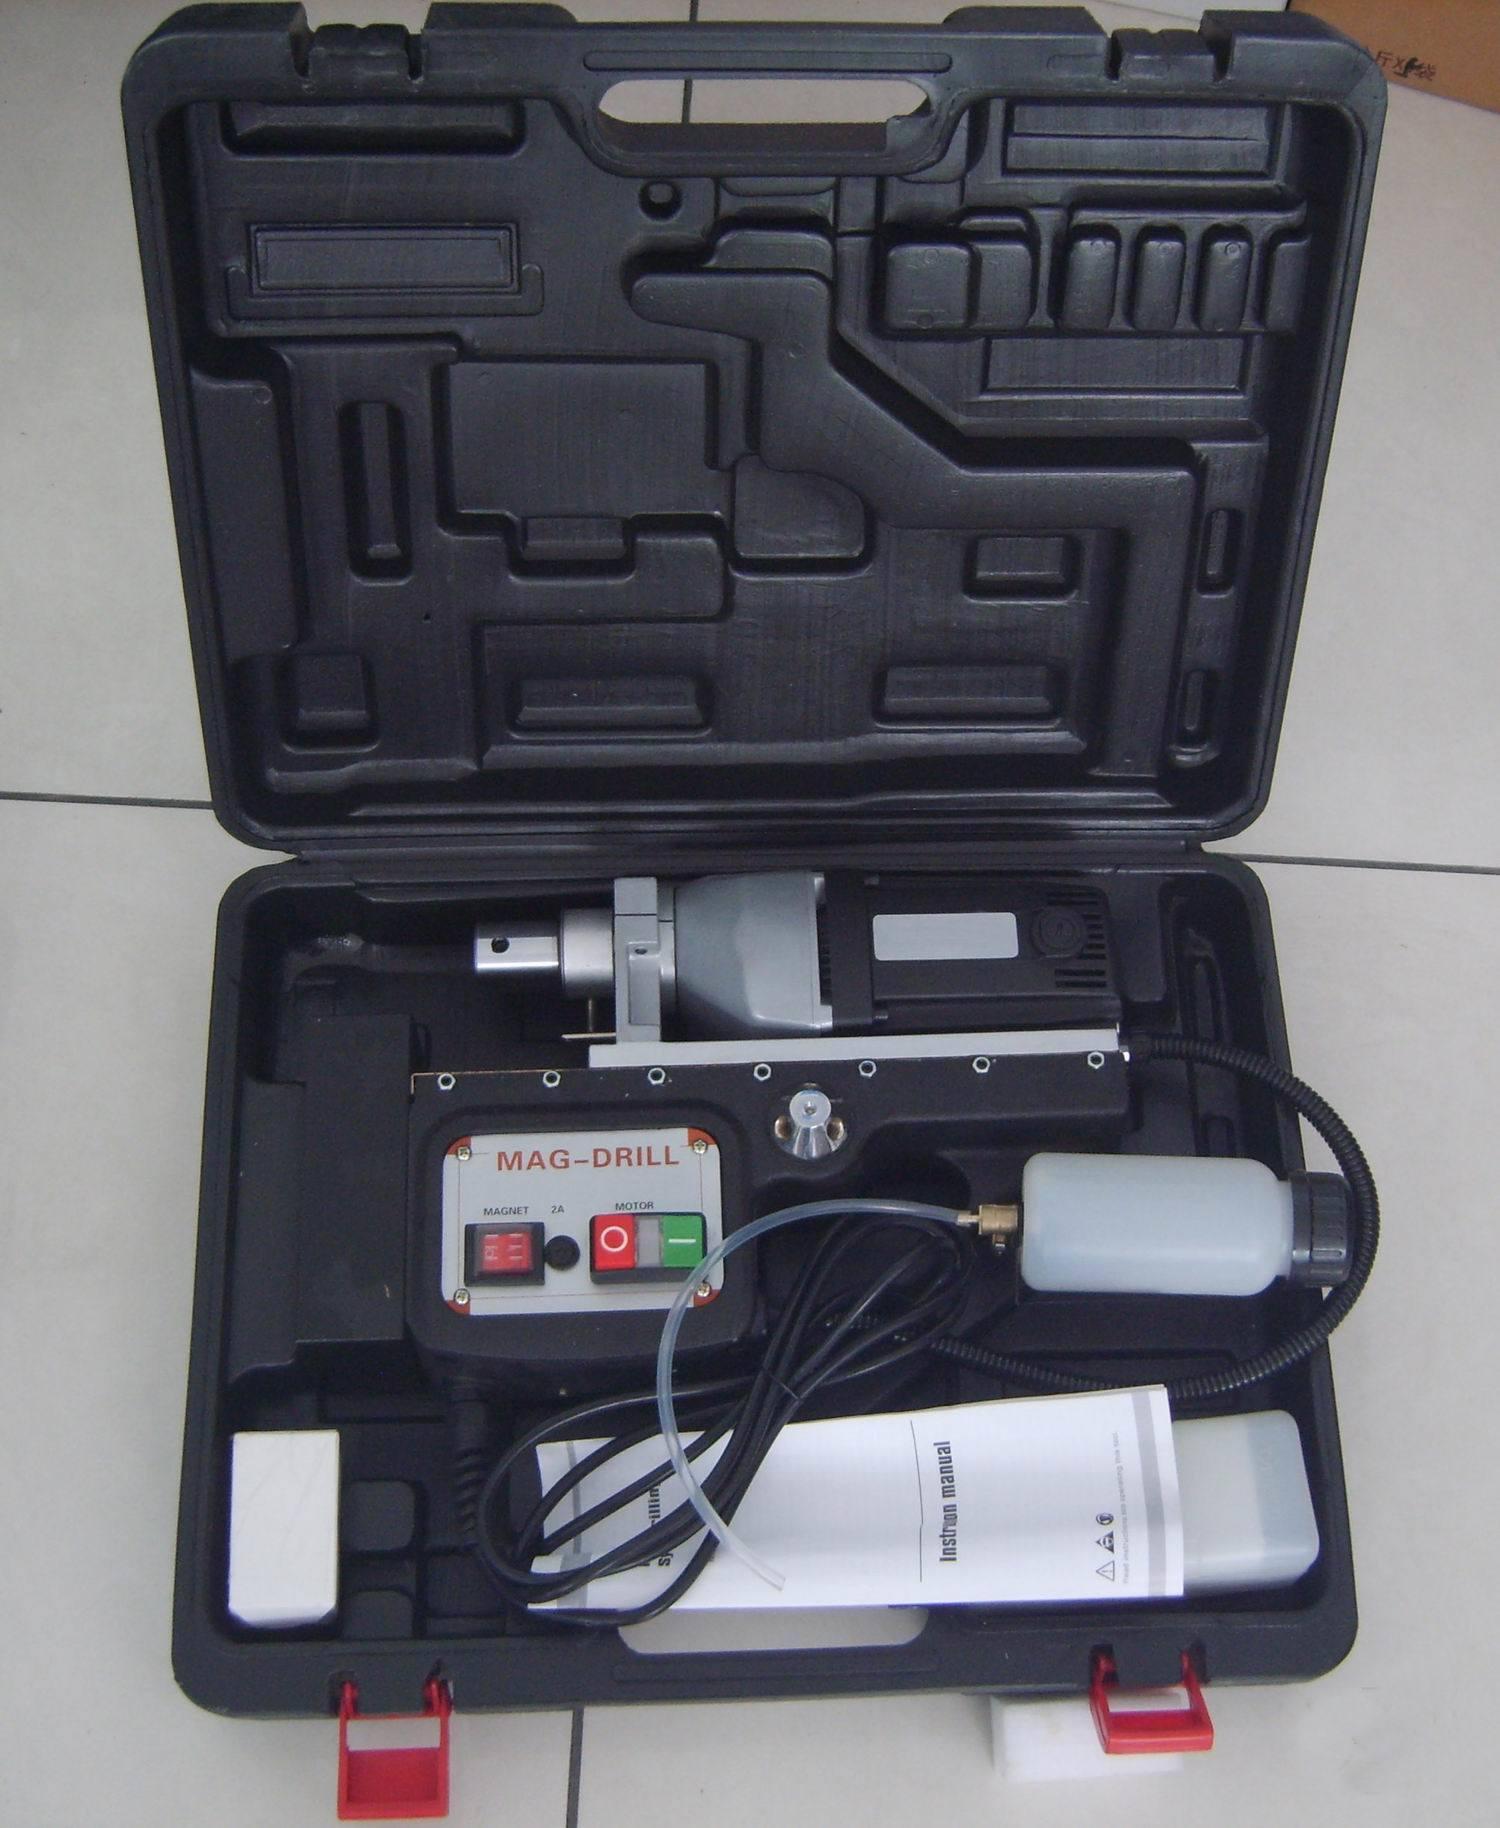 Chm-35b Magnetic Drill, Core Drill